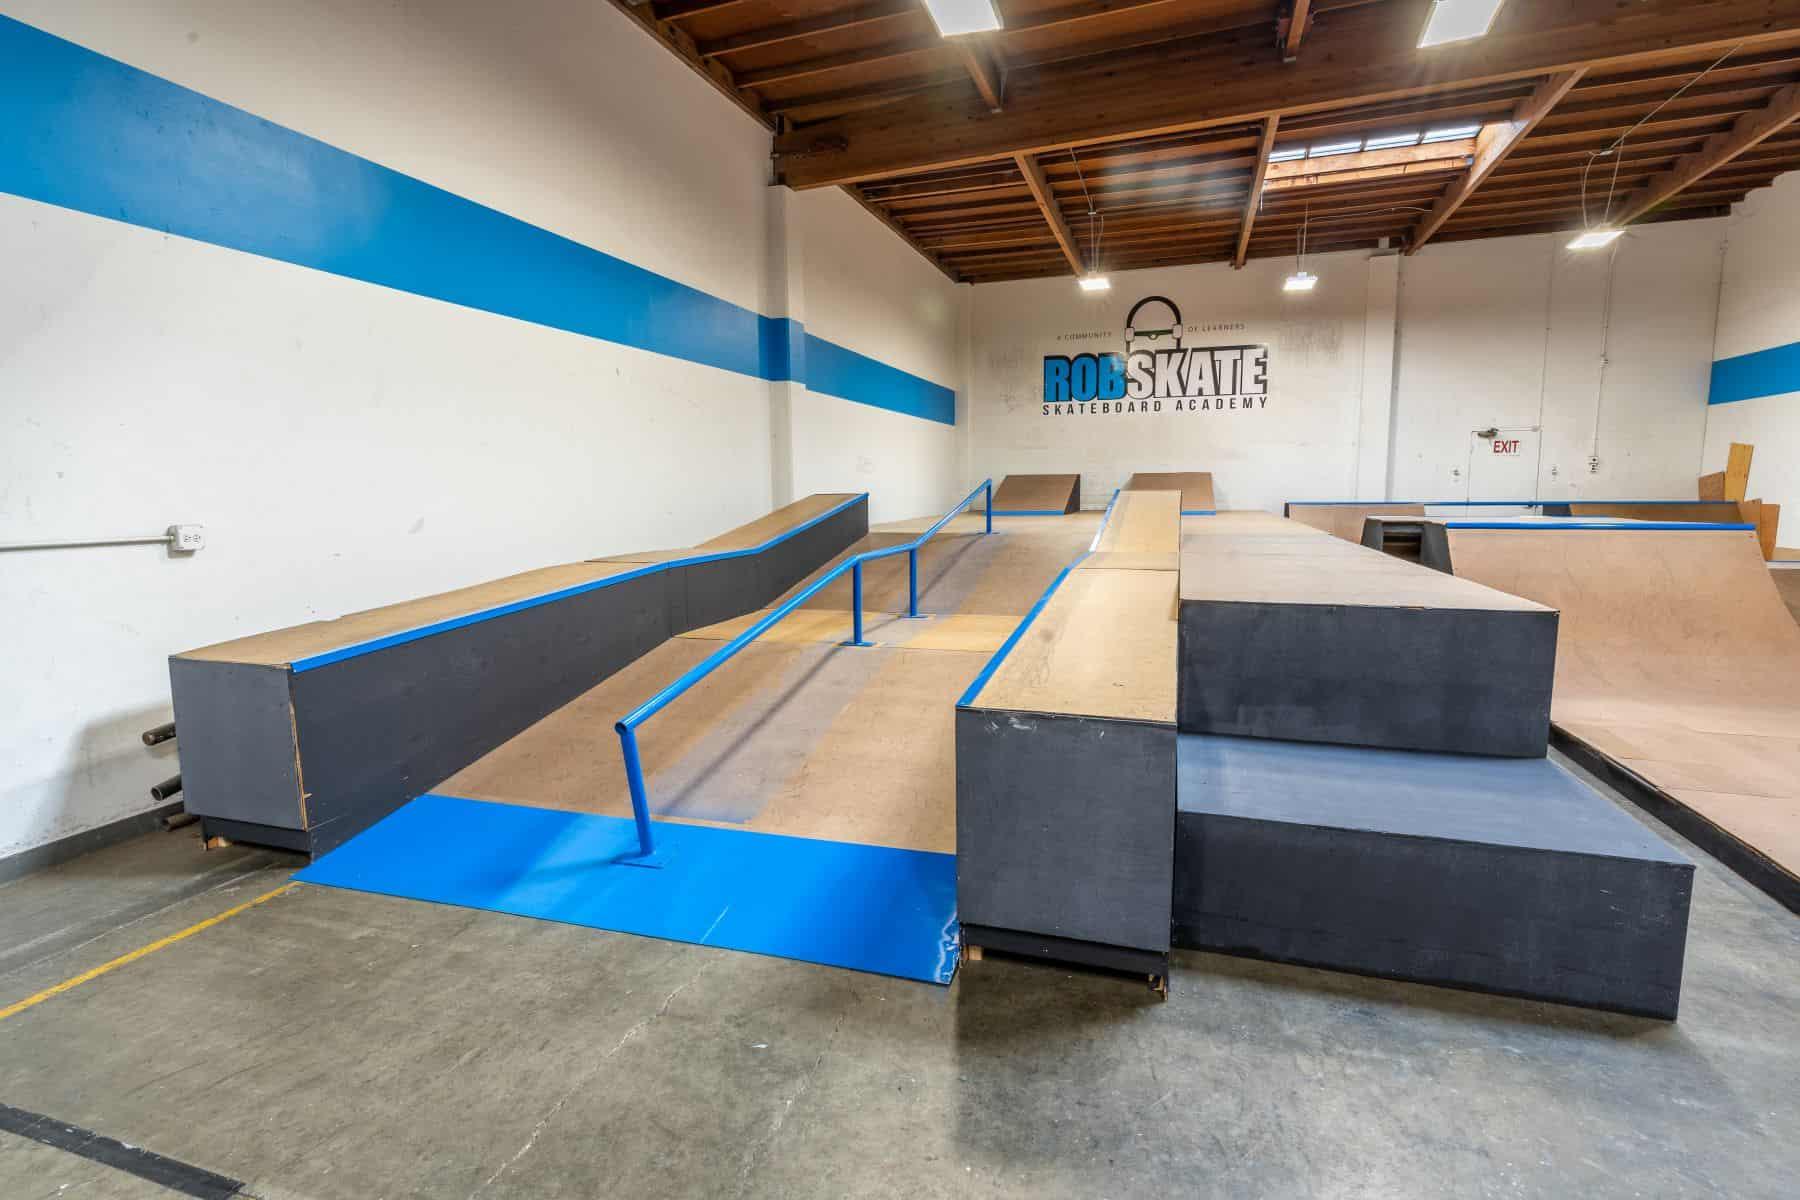 Rob Skate - San Leandro Private Skatepark 19